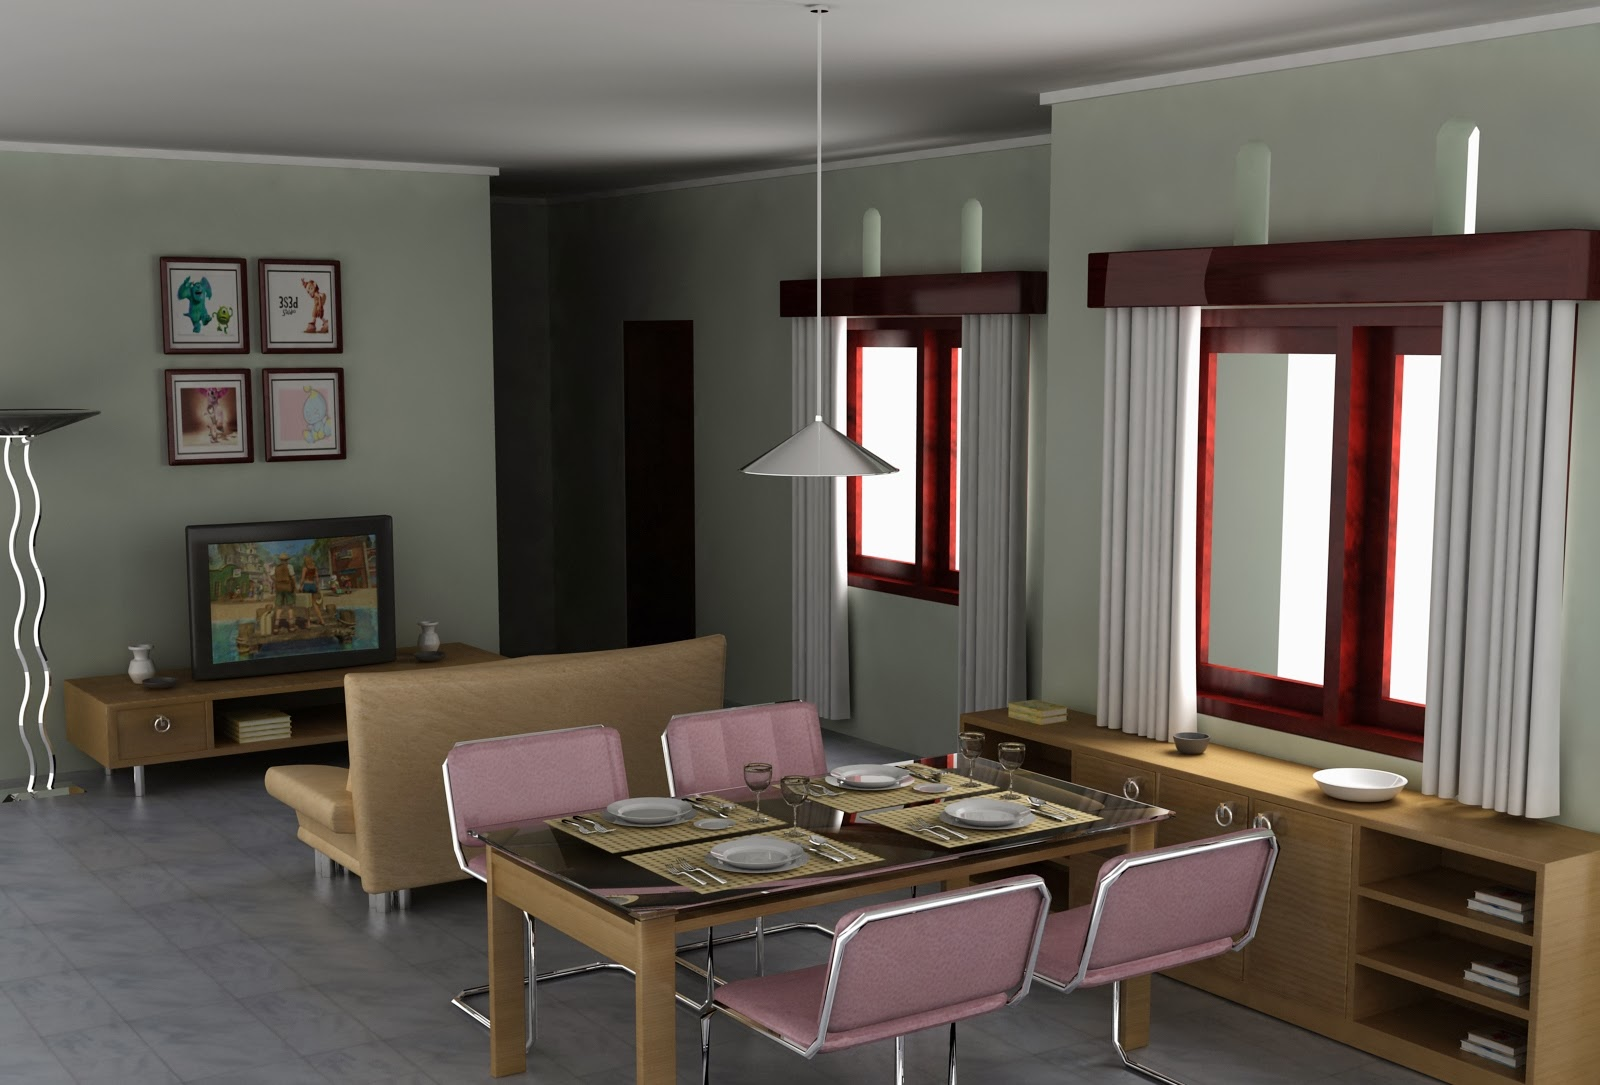 Foto interior rumah mungil 87